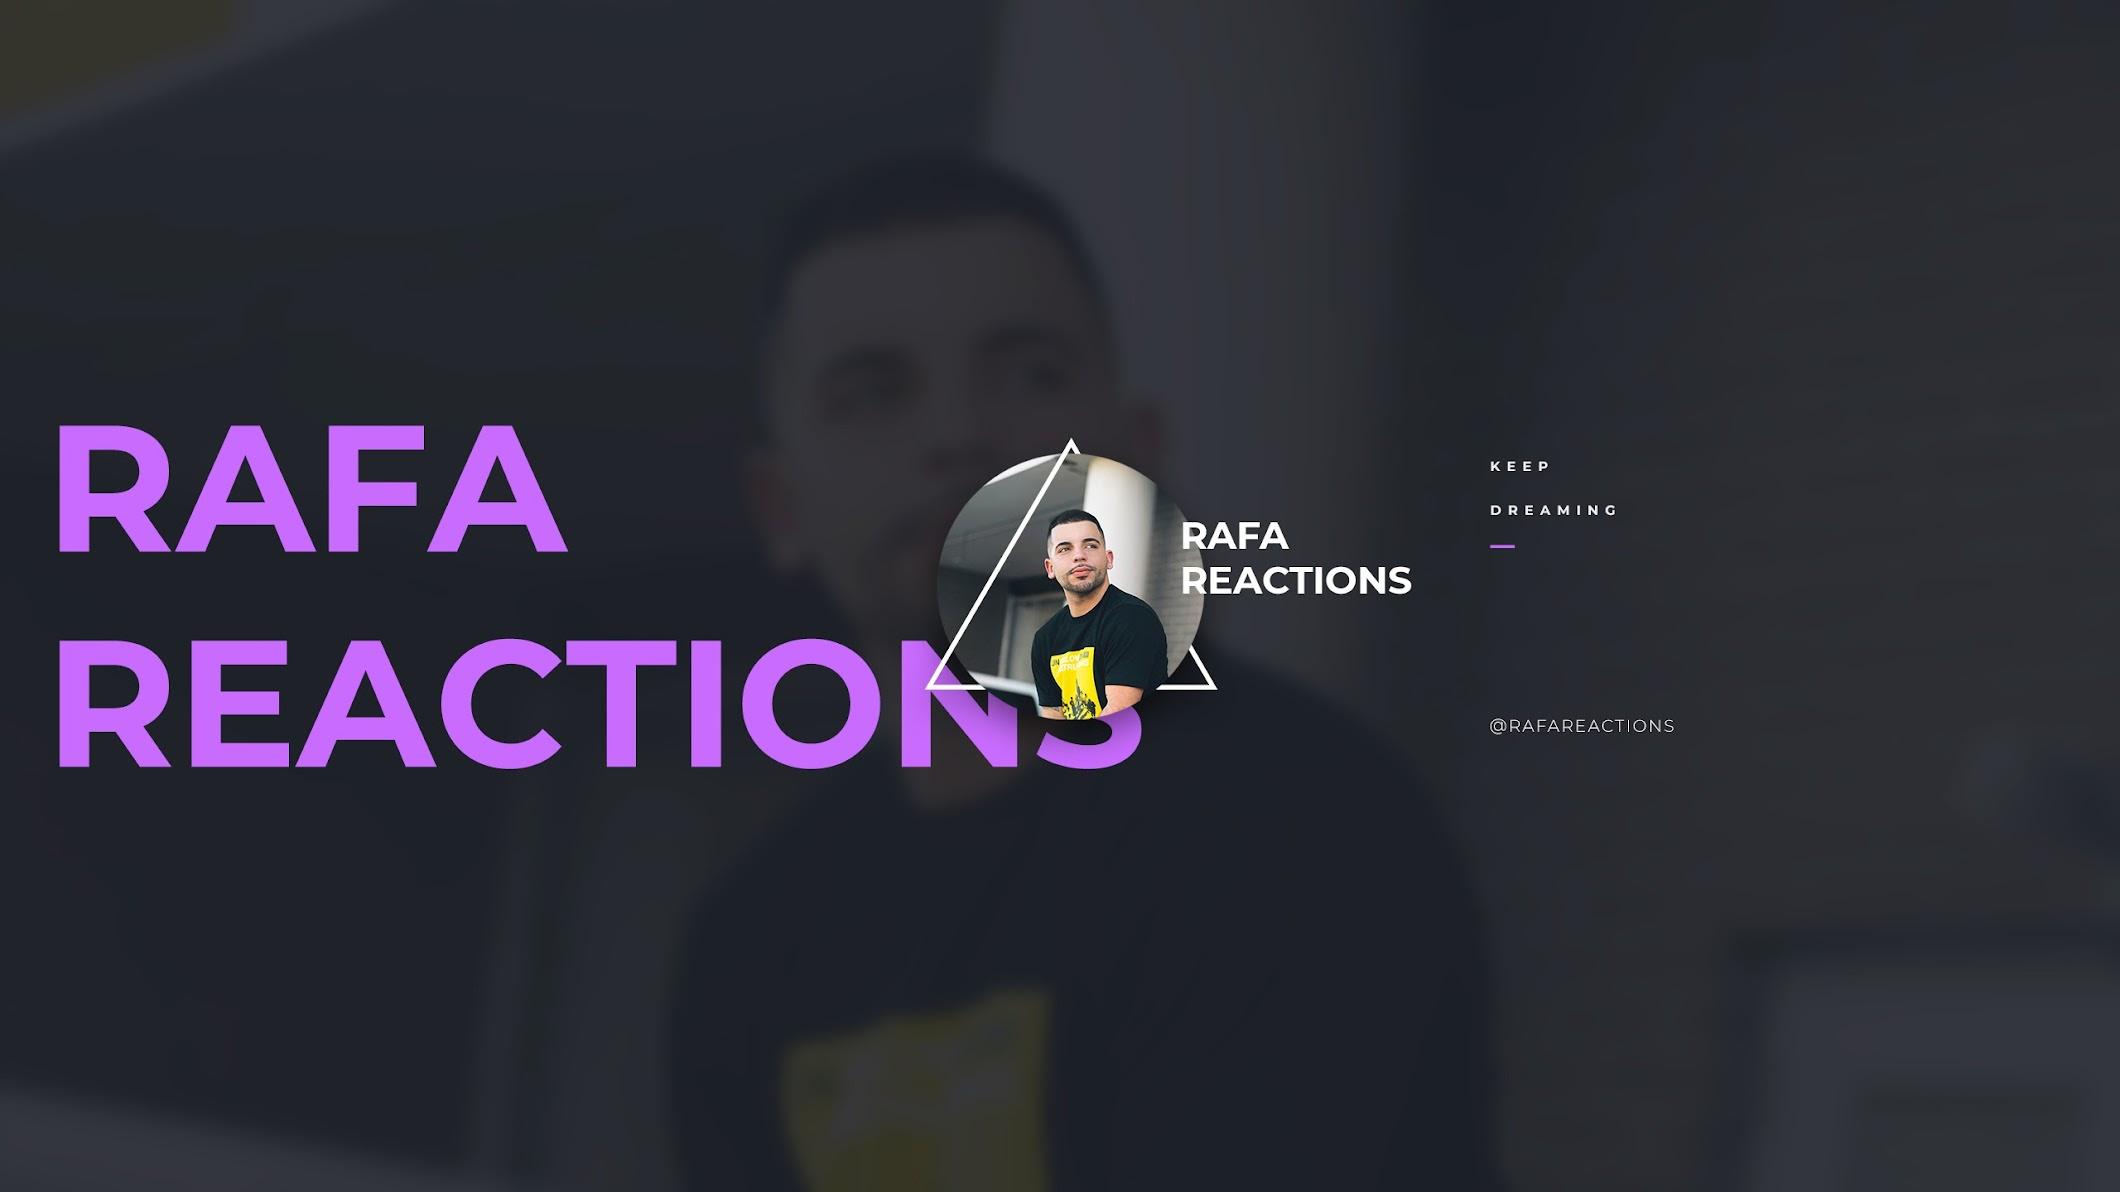 Rafa Reactions